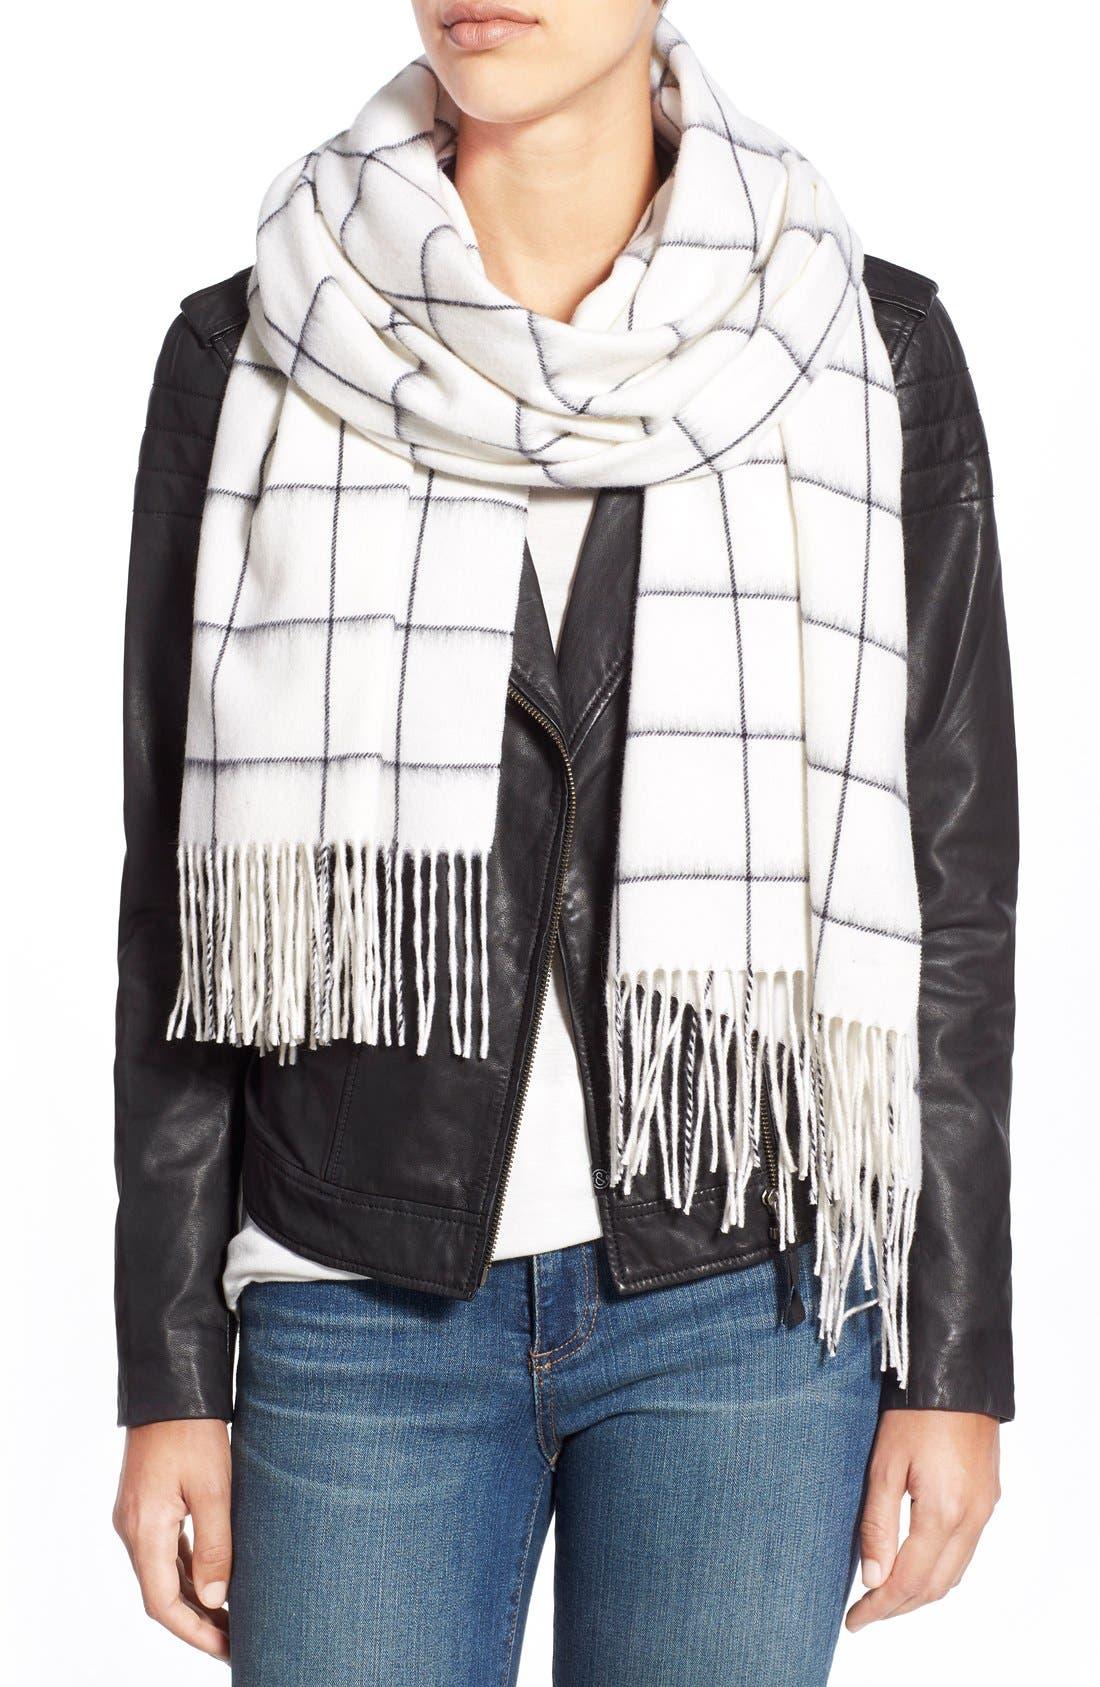 Alternate Image 1 Selected - rag & bone 'Brushed Check' Merino Wool Scarf